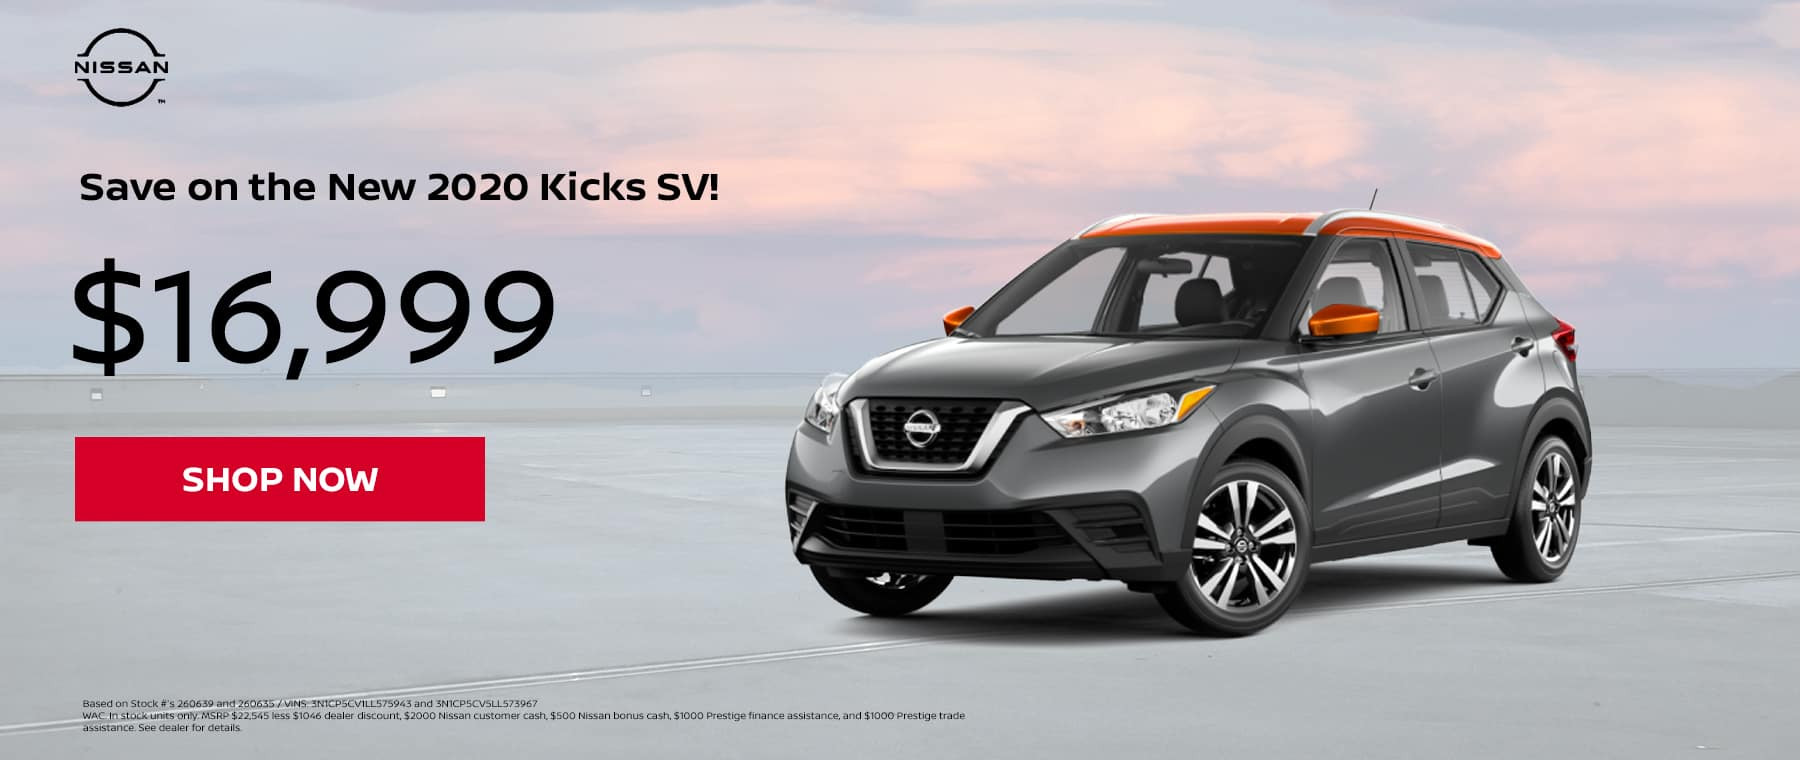 New 2020 Kicks SV!